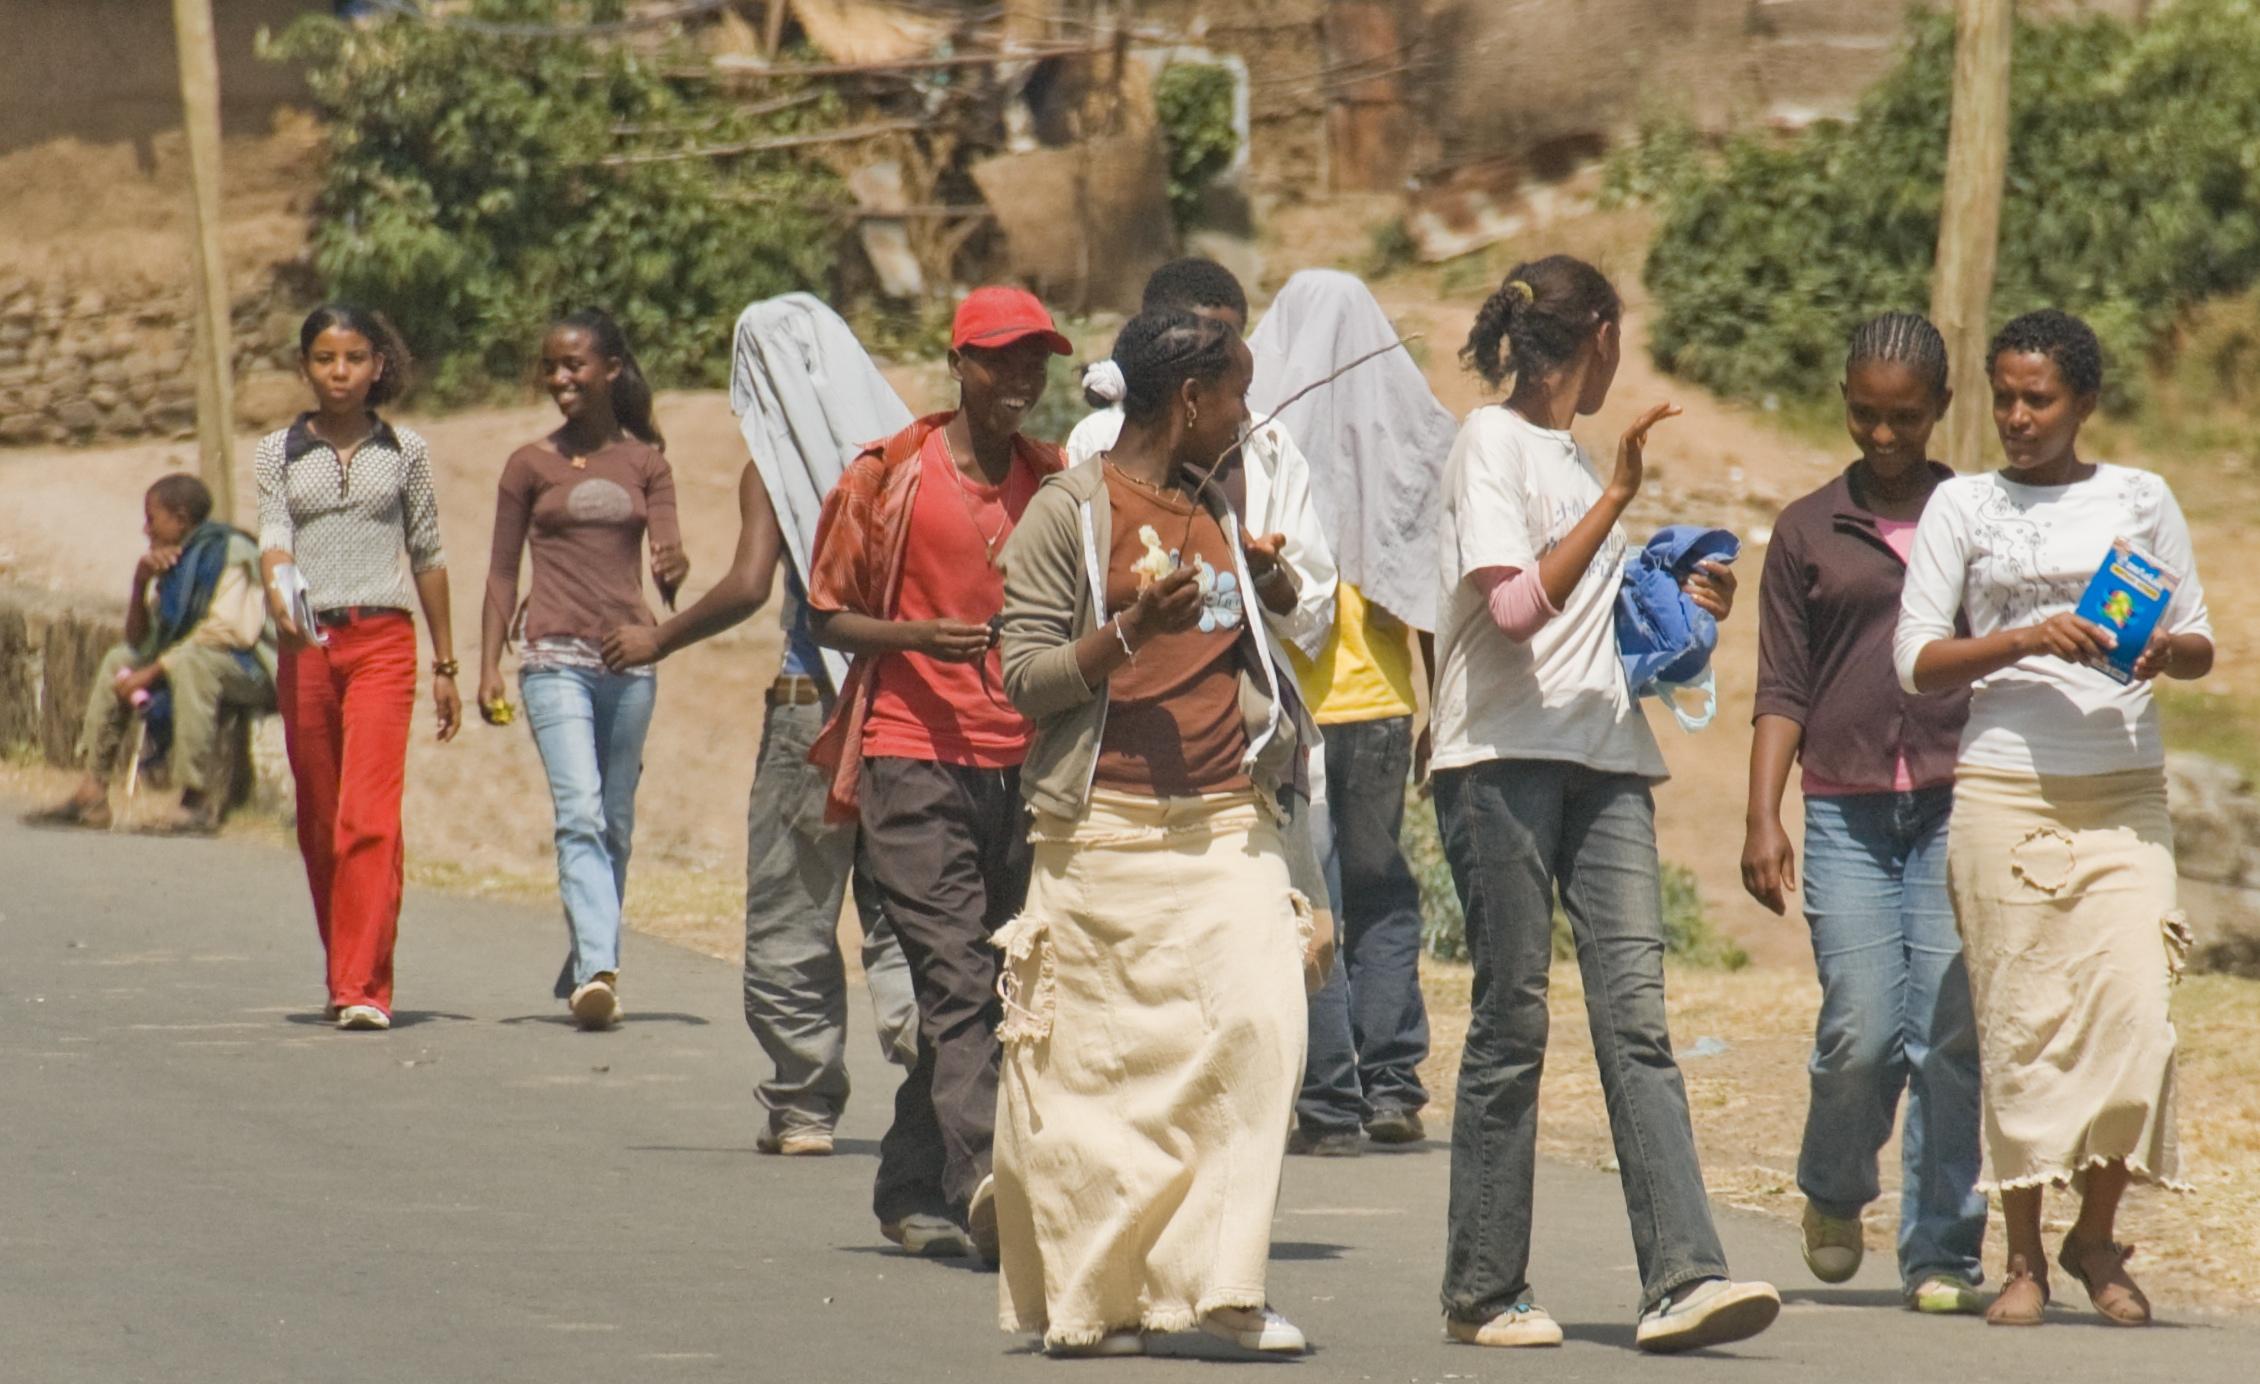 Ethiopian youth |  Alan  | flickr